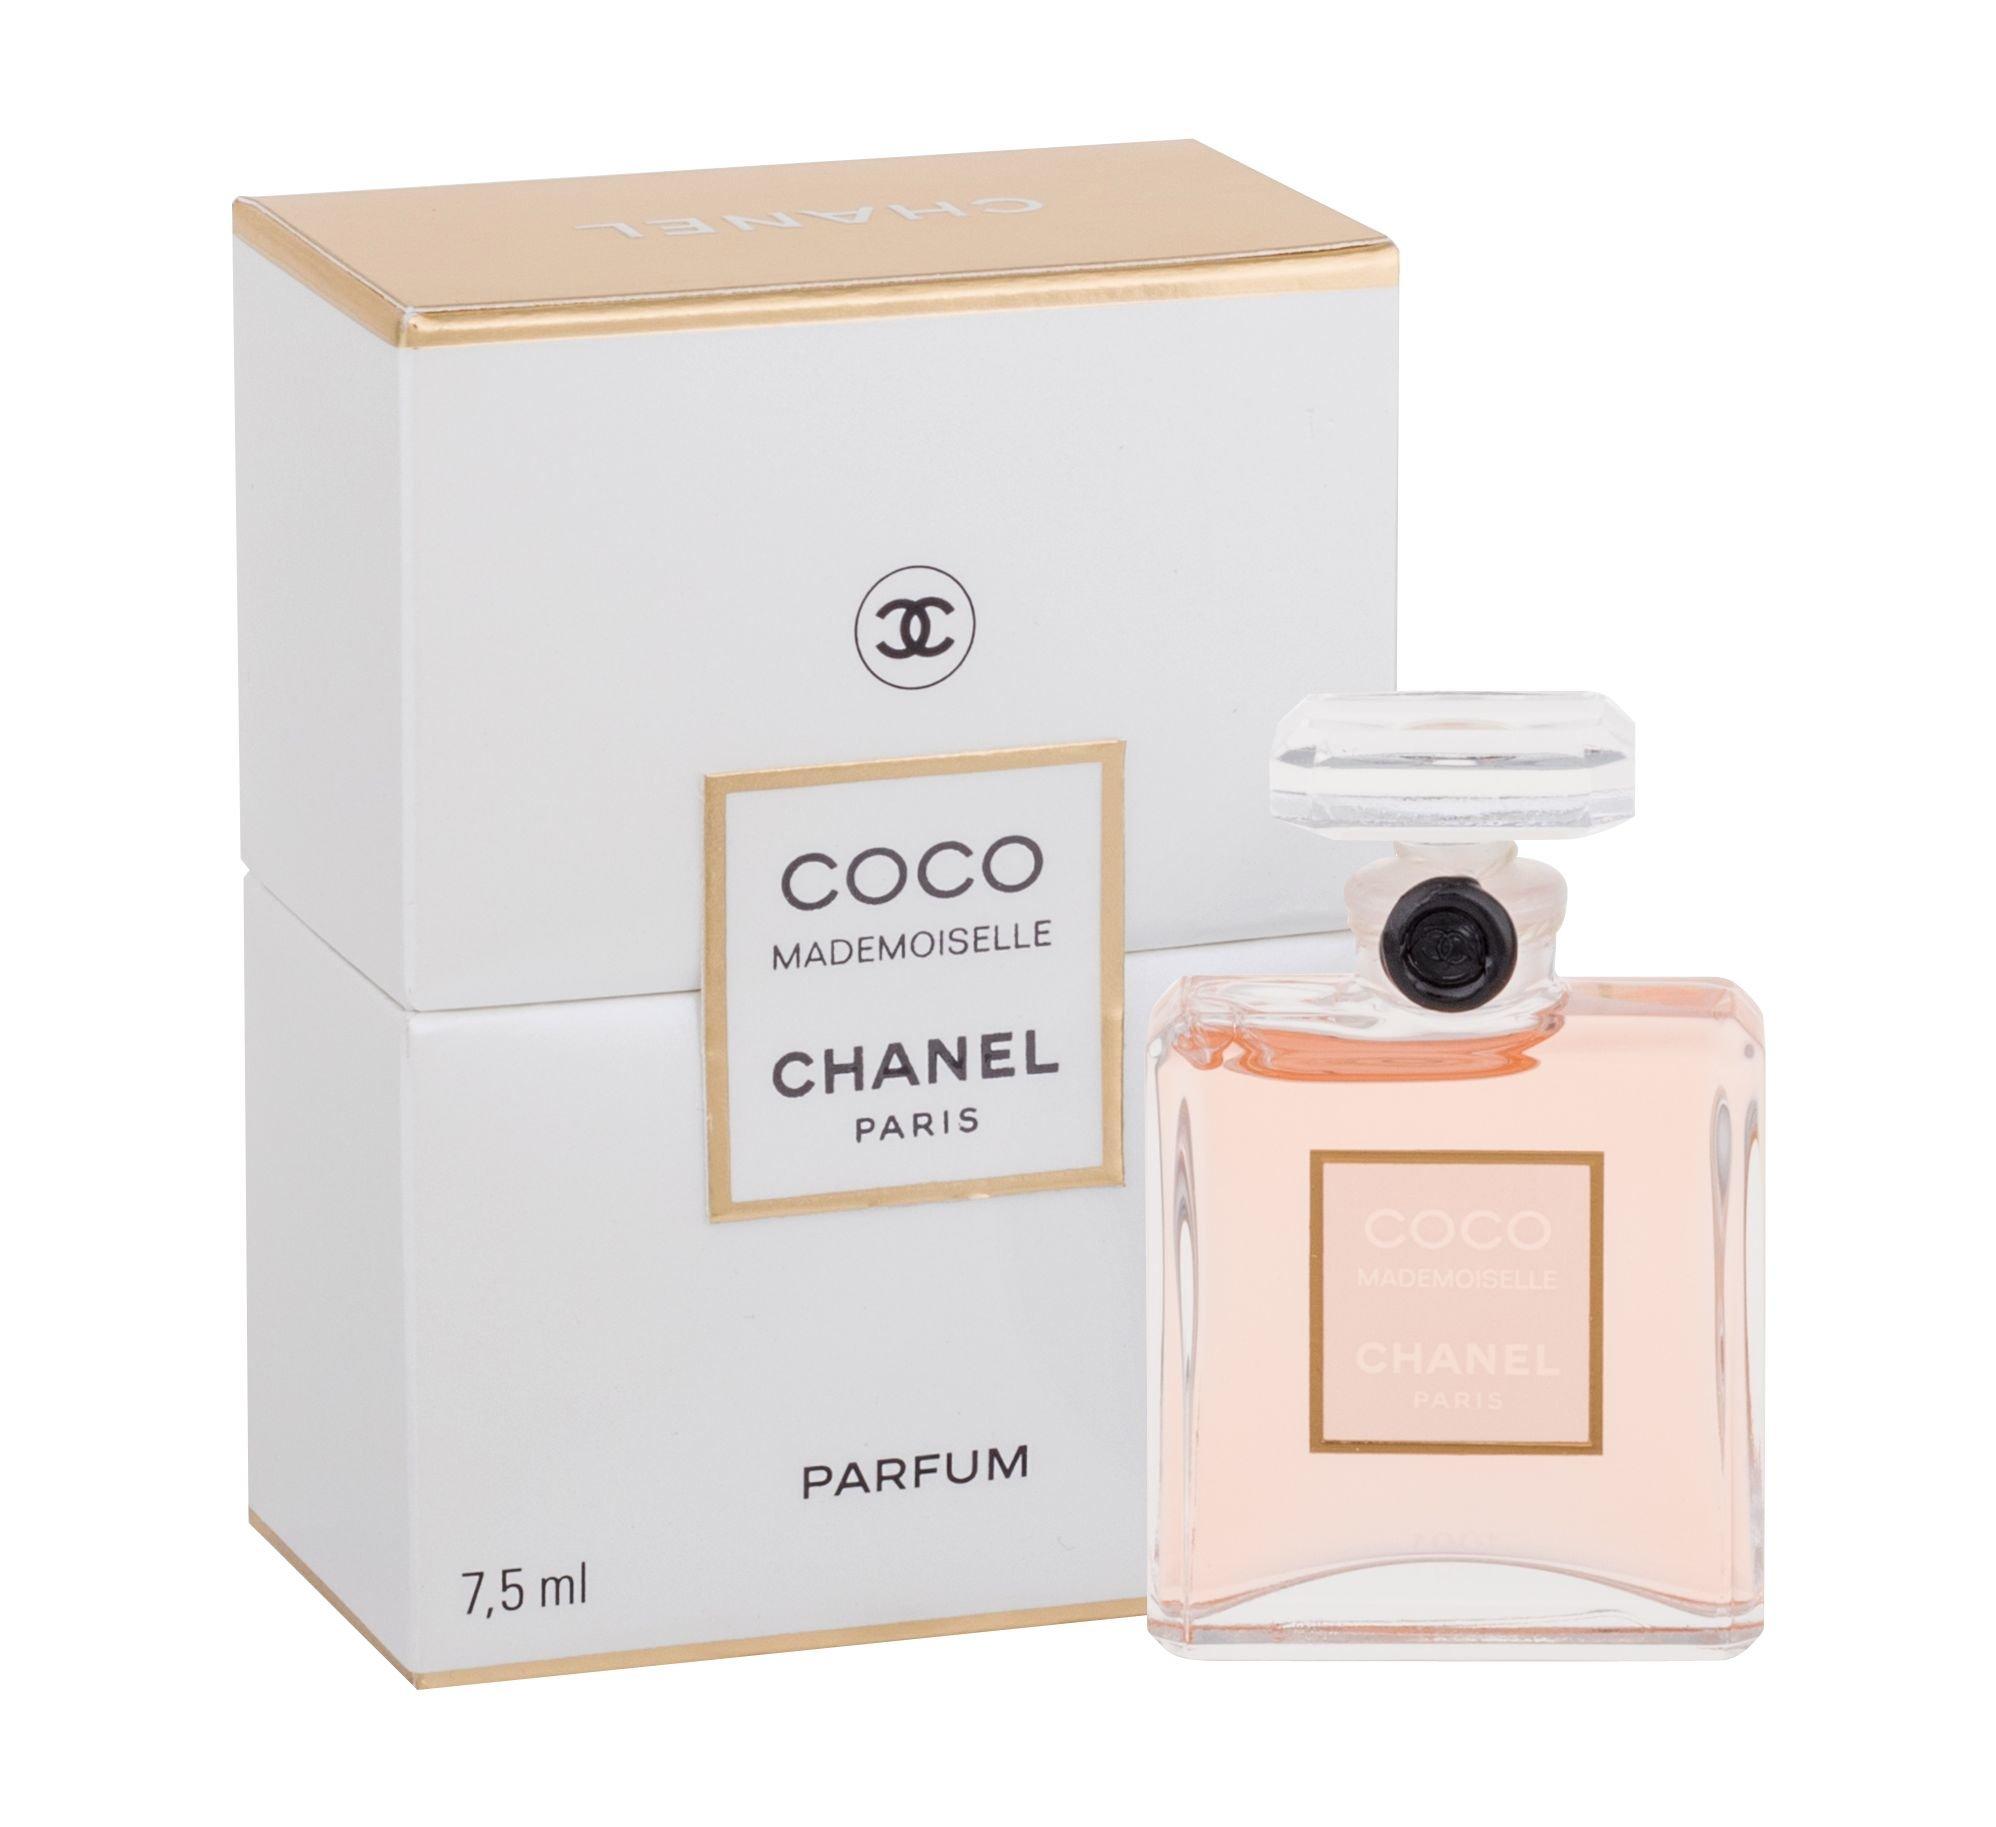 Chanel Coco Mademoiselle Parfem 7,5ml